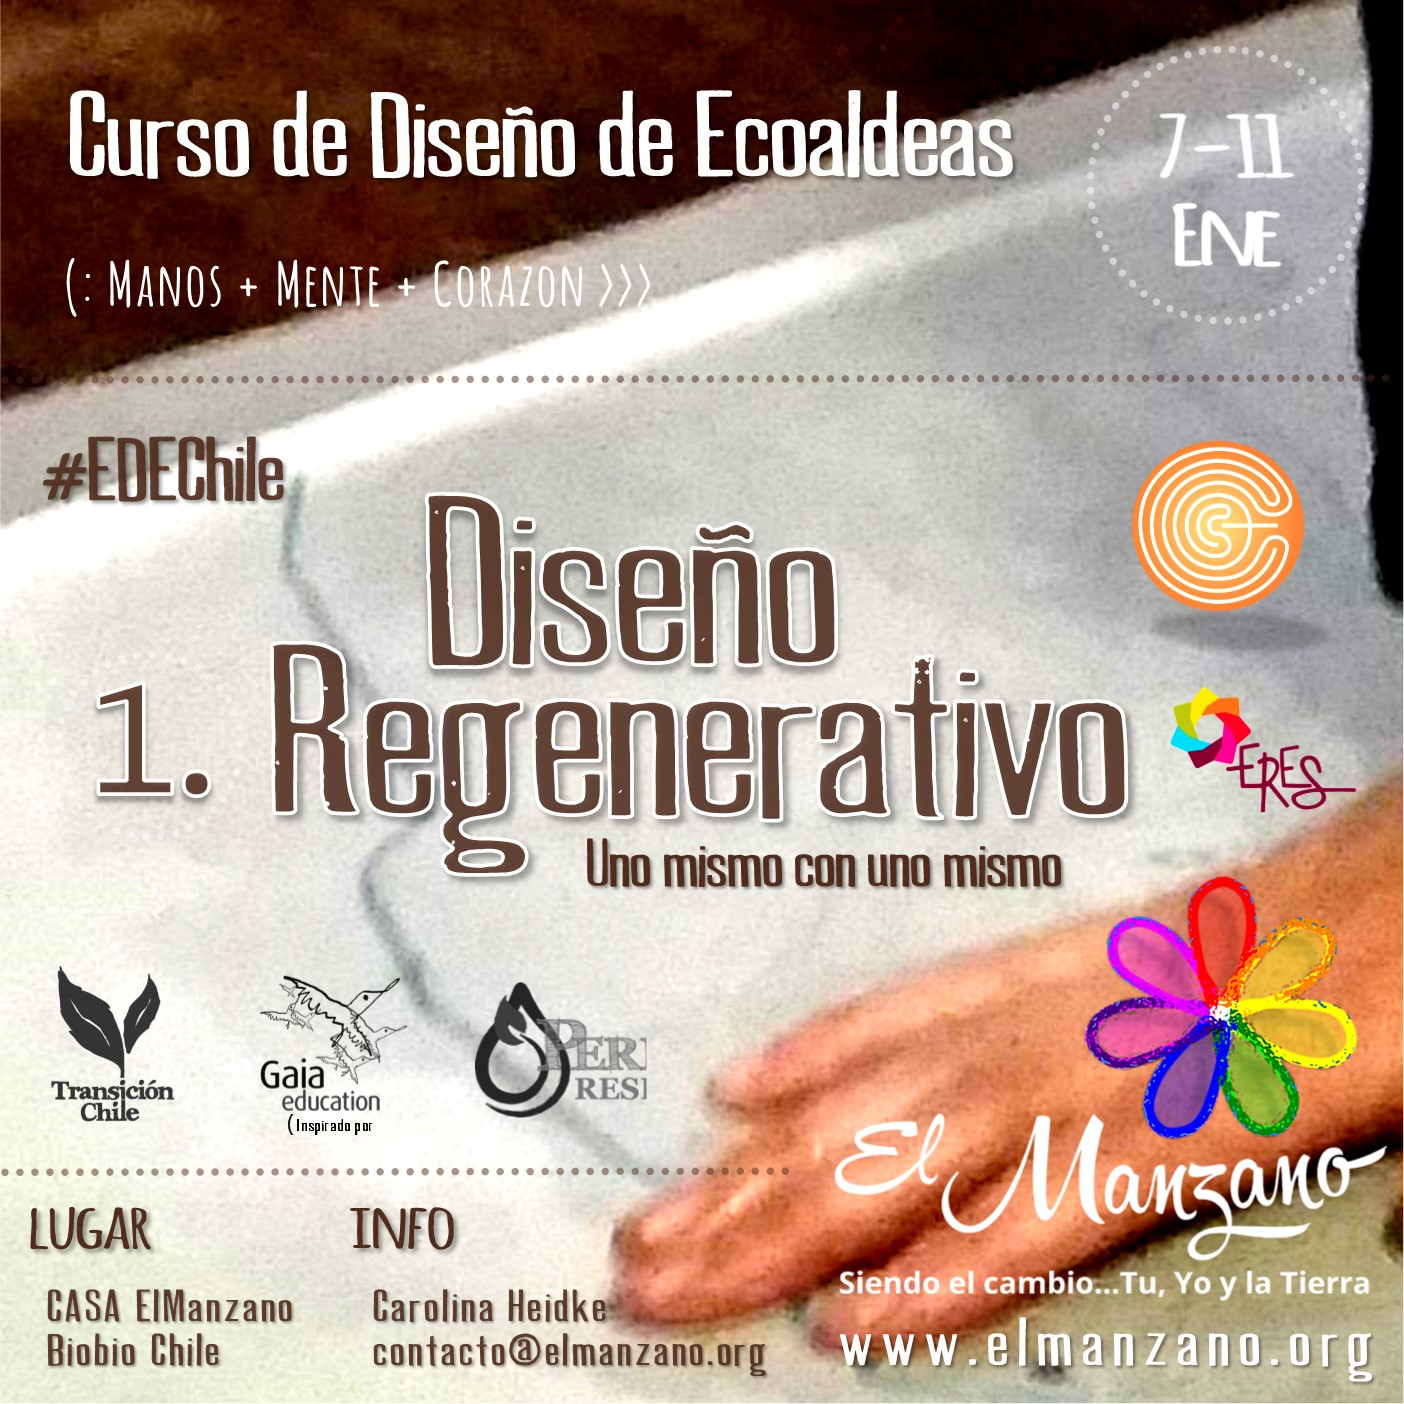 permacultura-diseno-regenerativo-ecoaldeas-el-manzano-chile-3-small